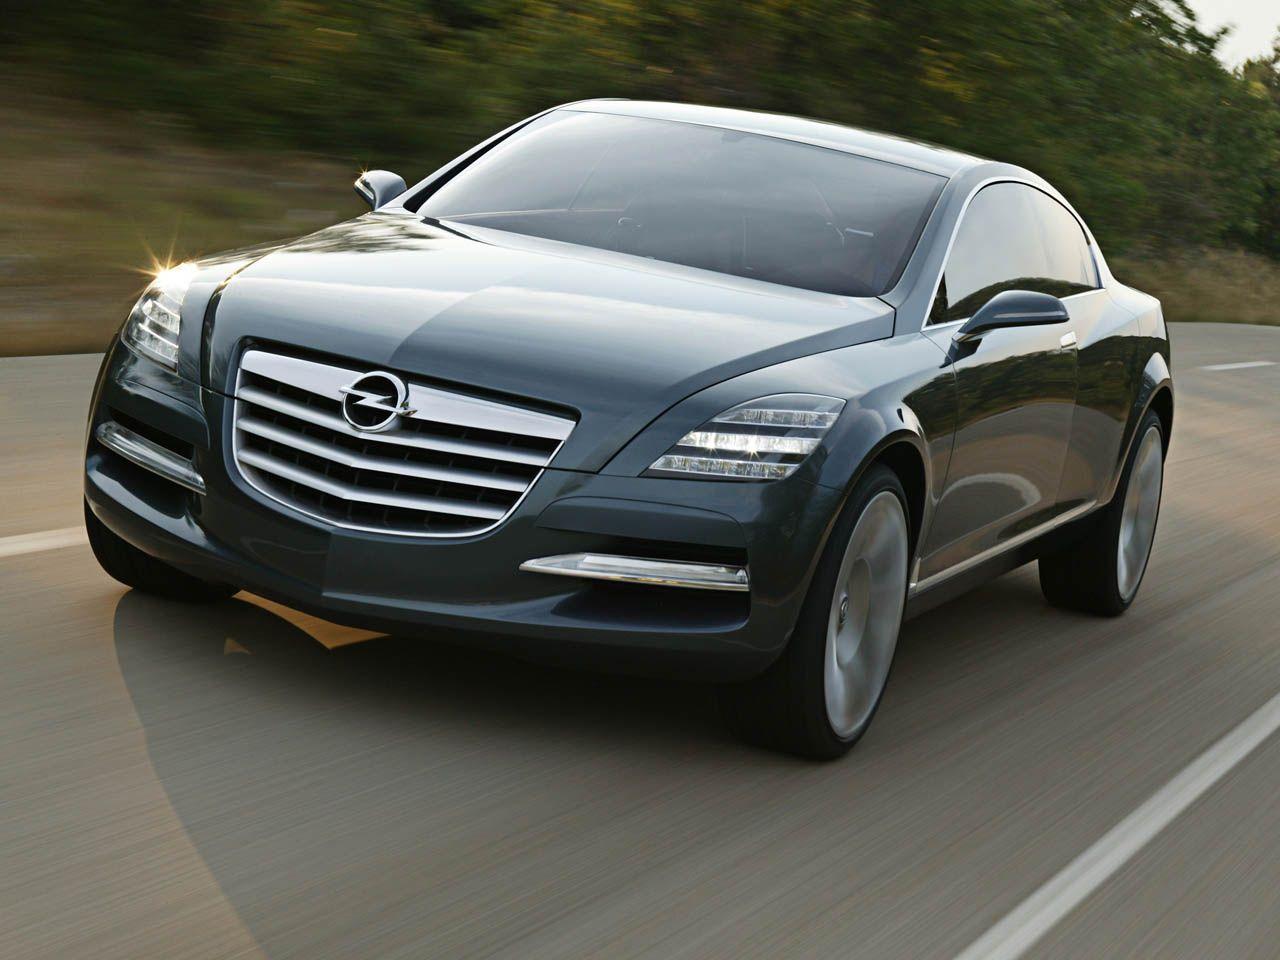 Opel Insignia Concept cars, Car rental, Cheap car rental